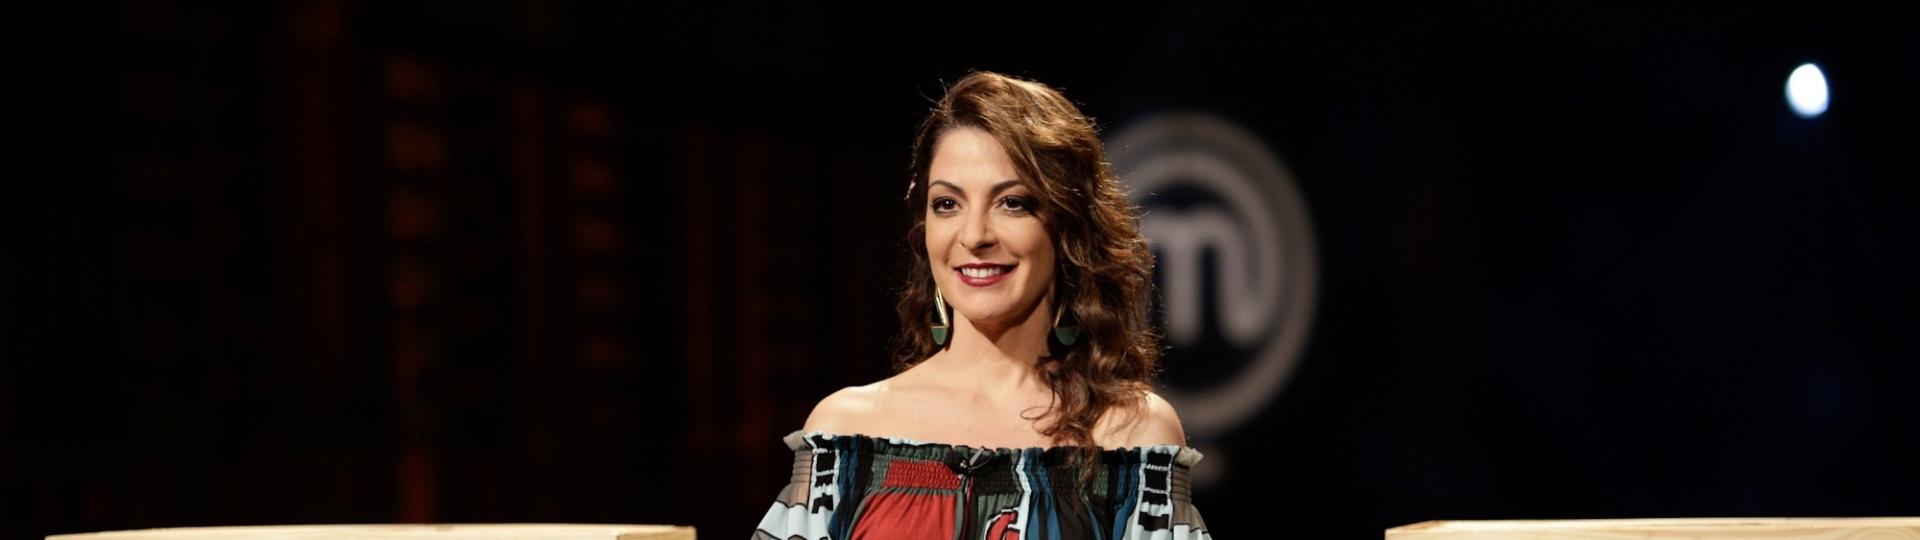 Ana Paula Padrão apresenta o